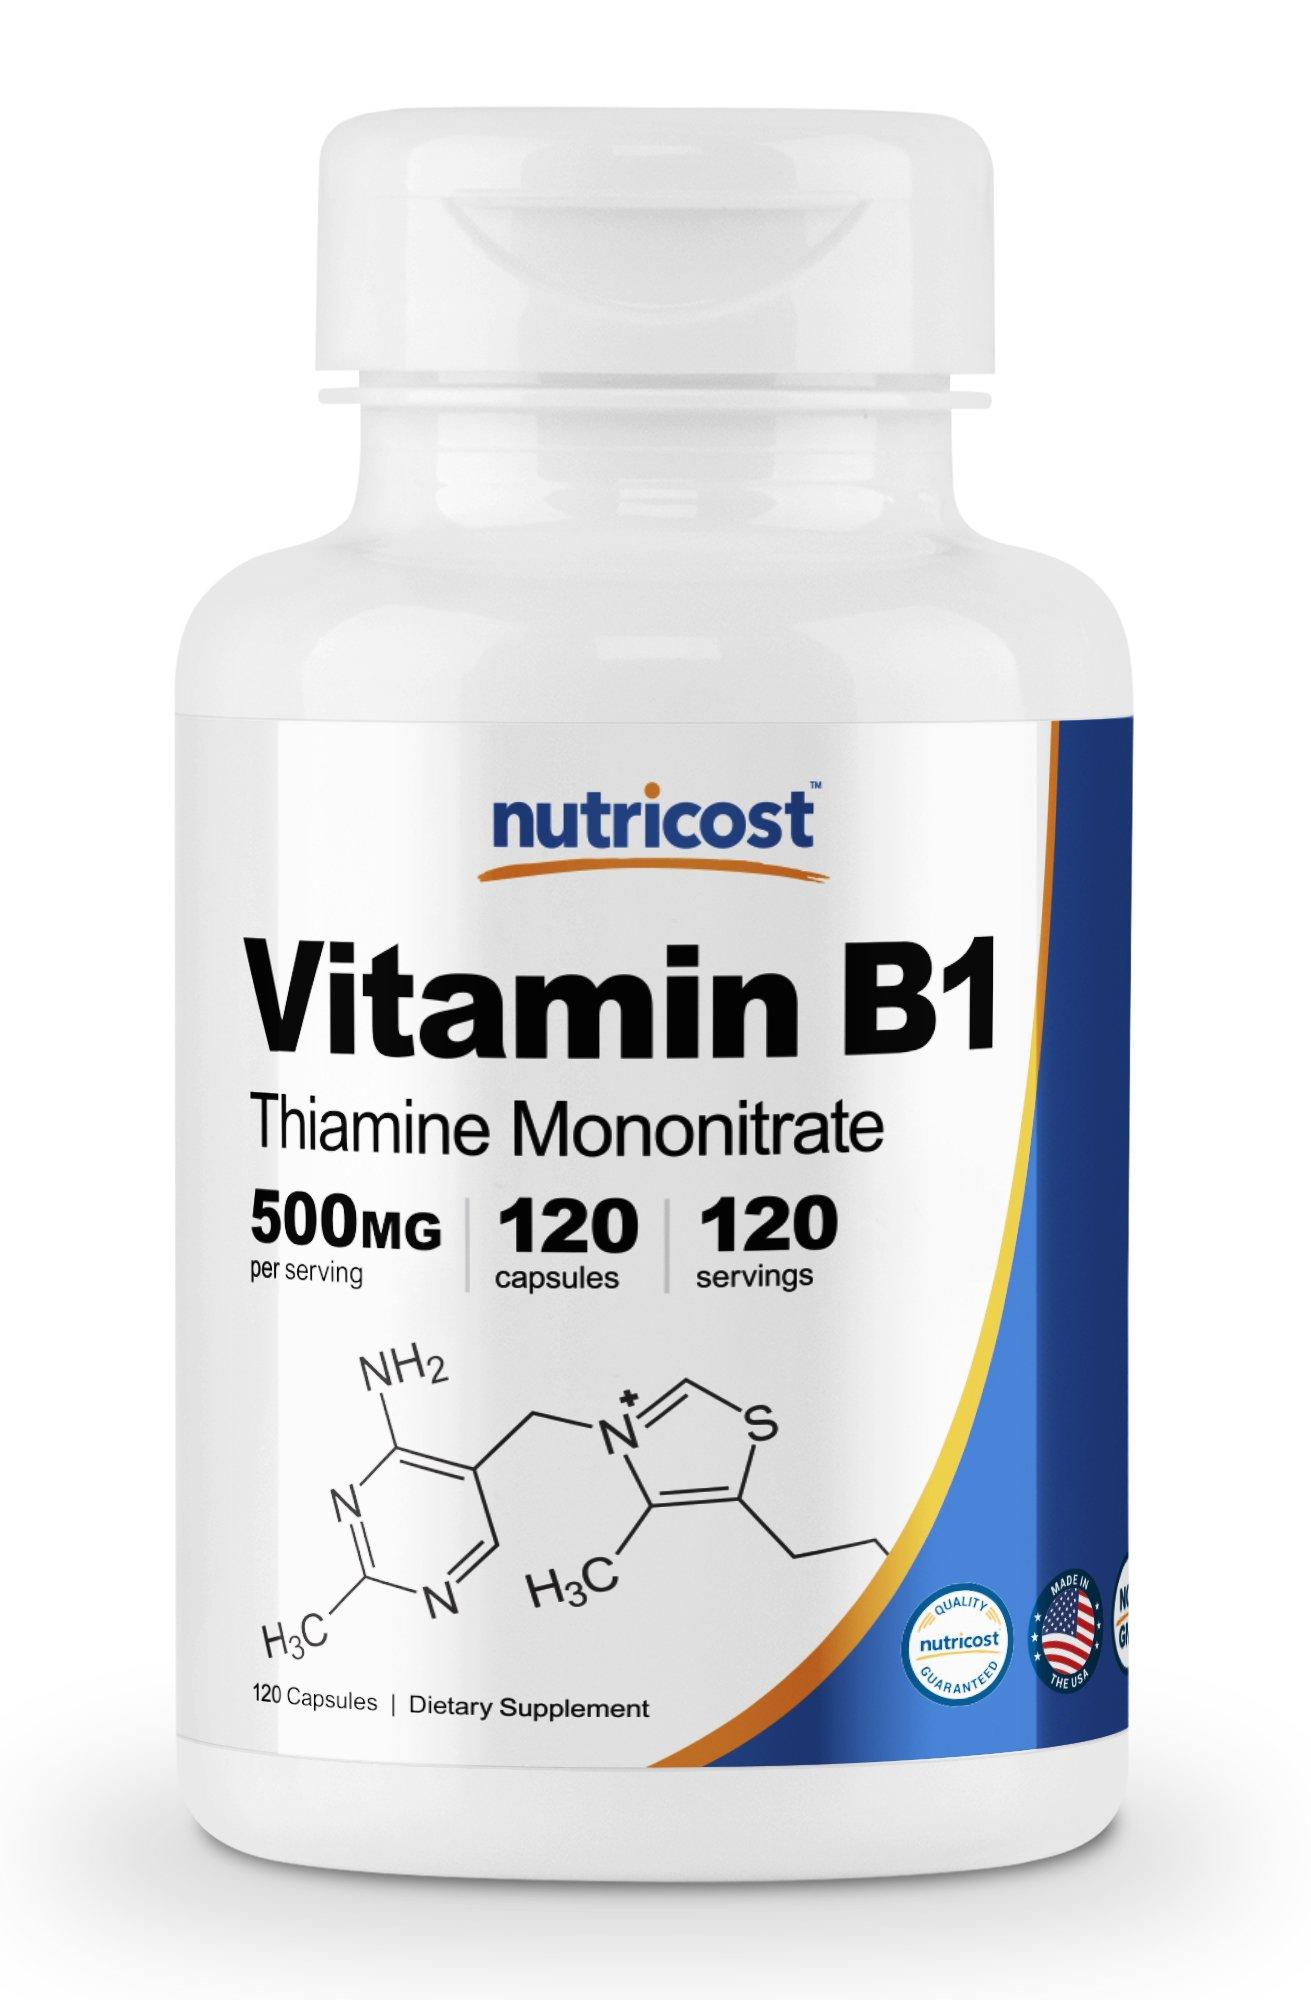 Nutricost Vitamin B1 (Thiamine) 500mg, 120 Capsules by Nutricost